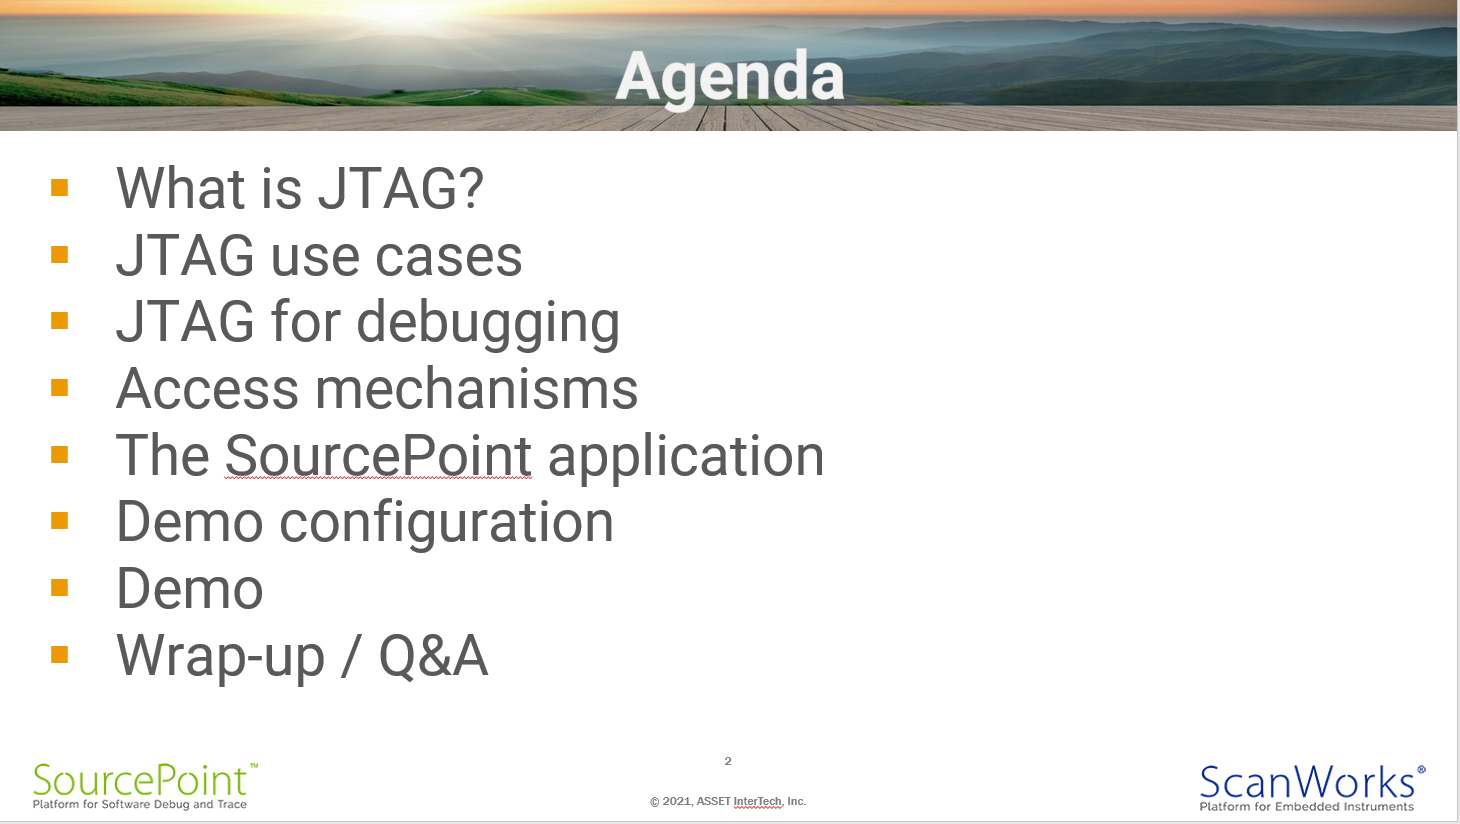 Agenda for SourcePoint AMD webinar